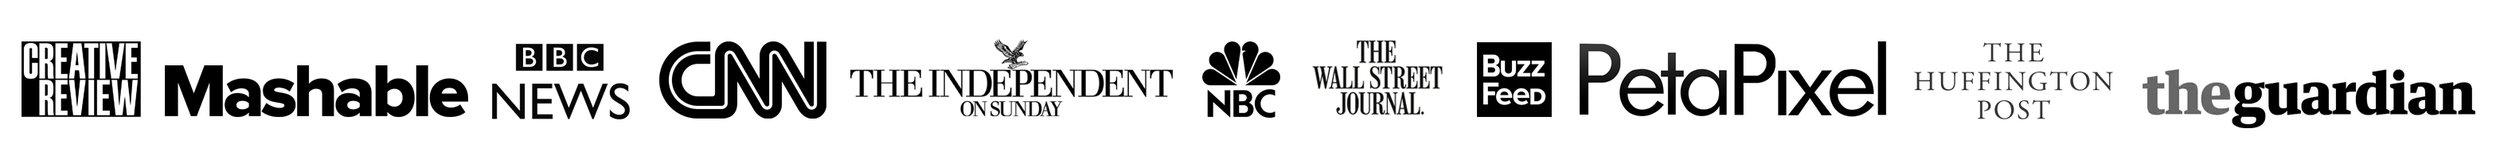 press logo copy.jpg